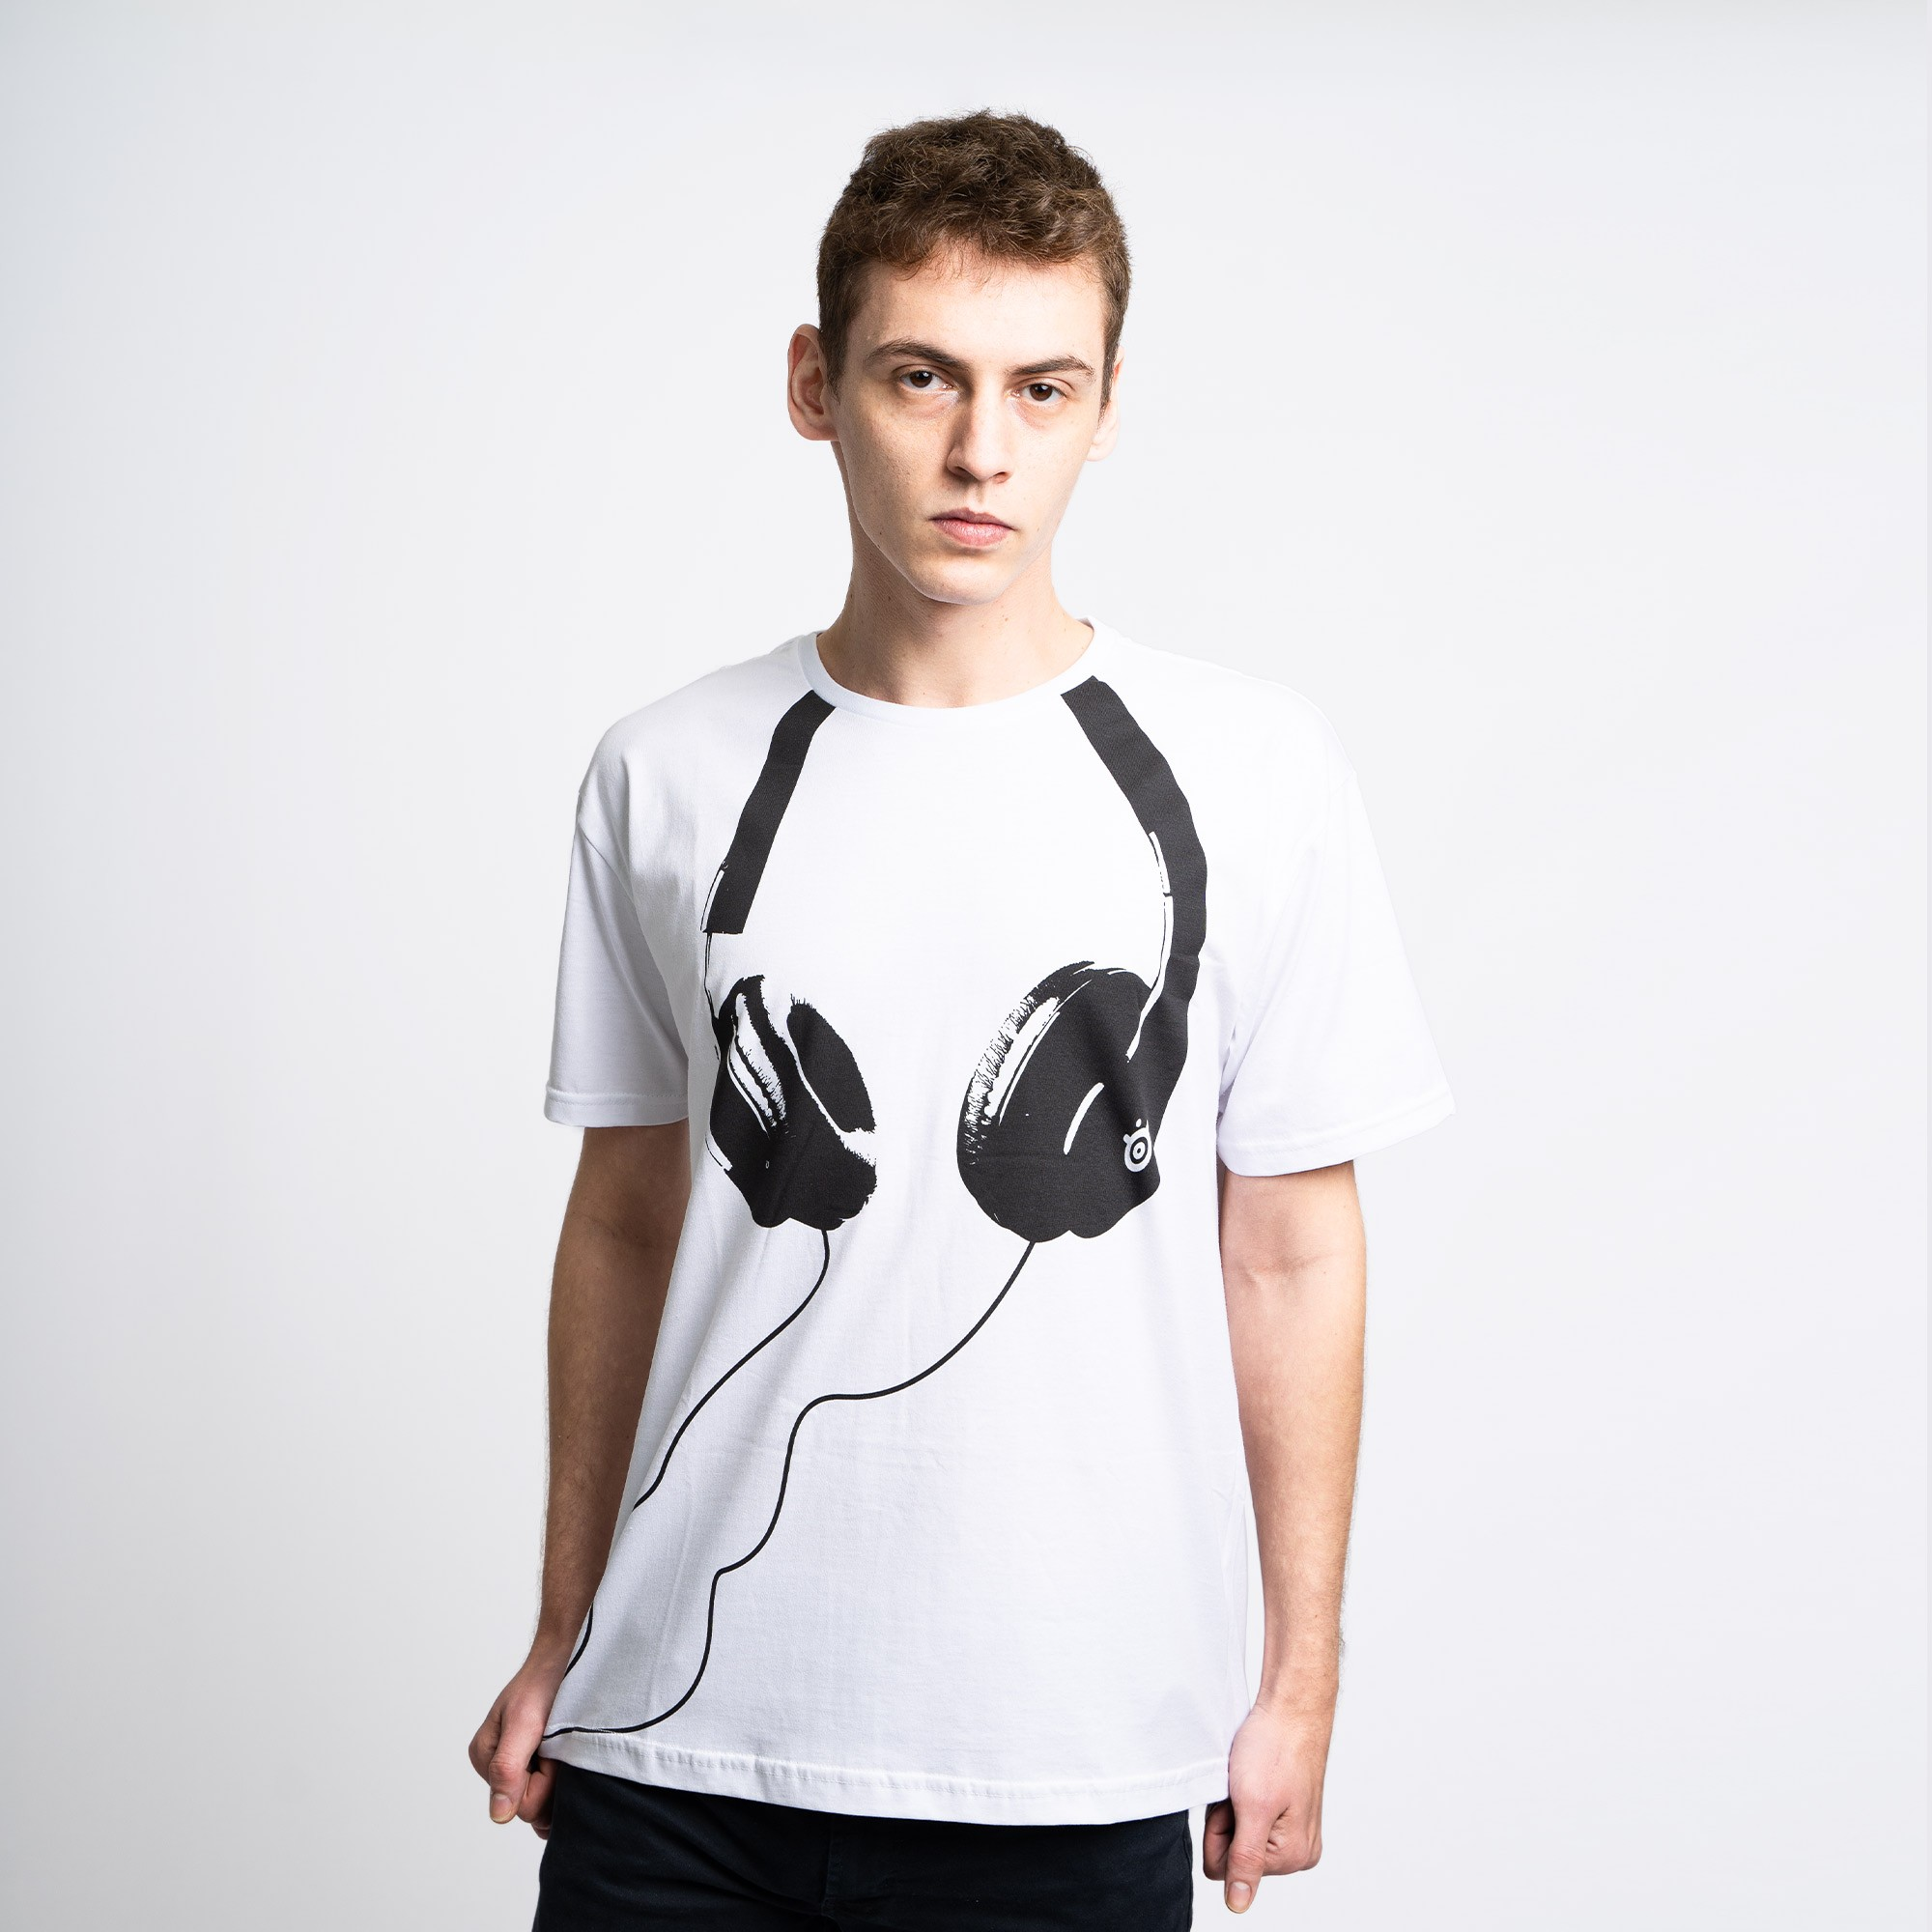 Camiseta Steelseries Headset Branca